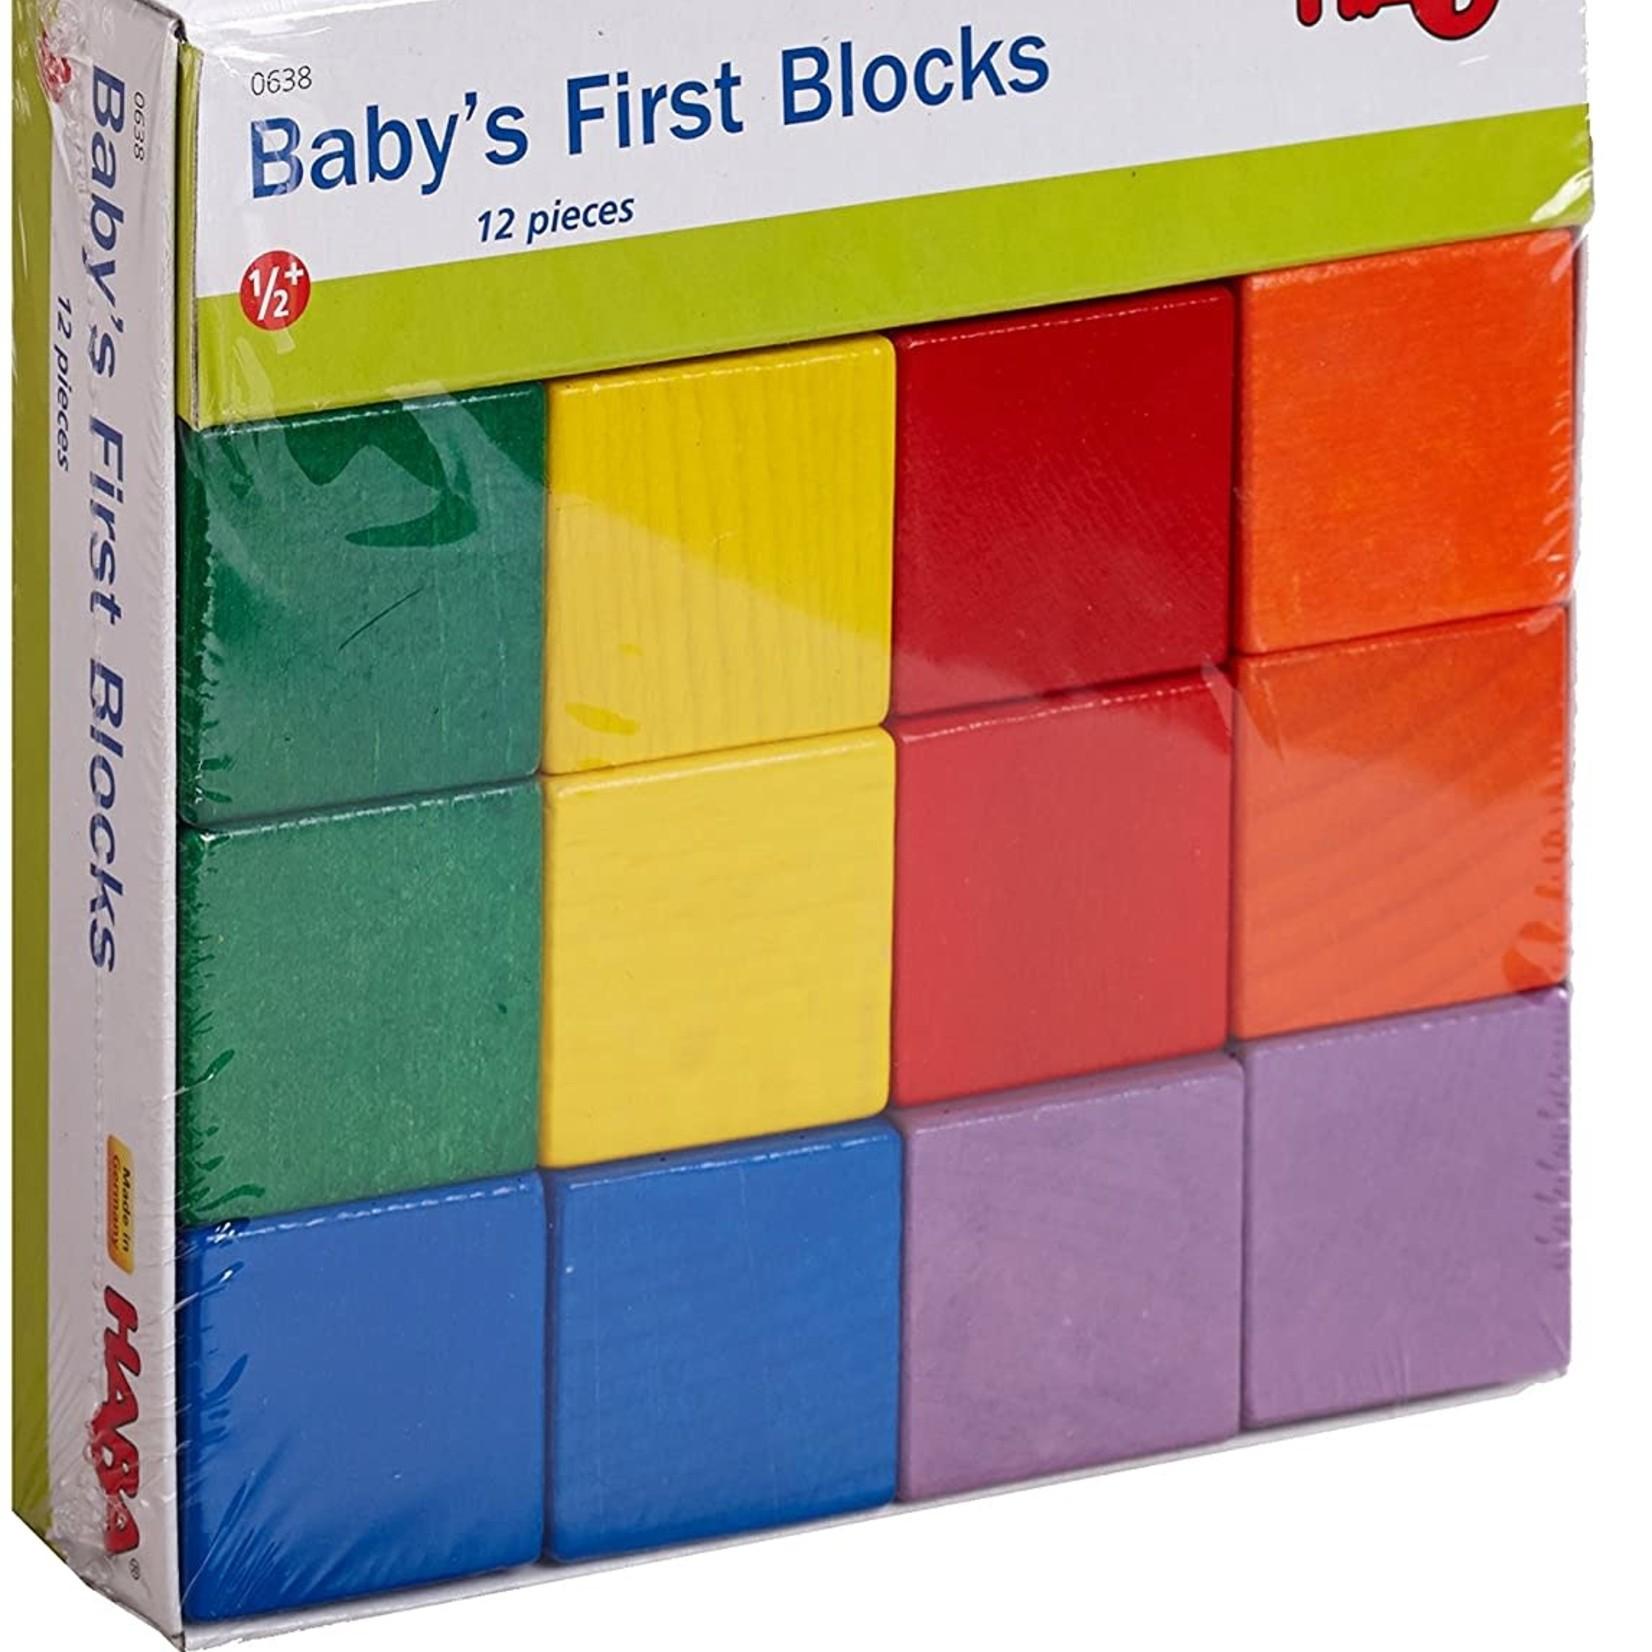 Haba Baby's First Blocks